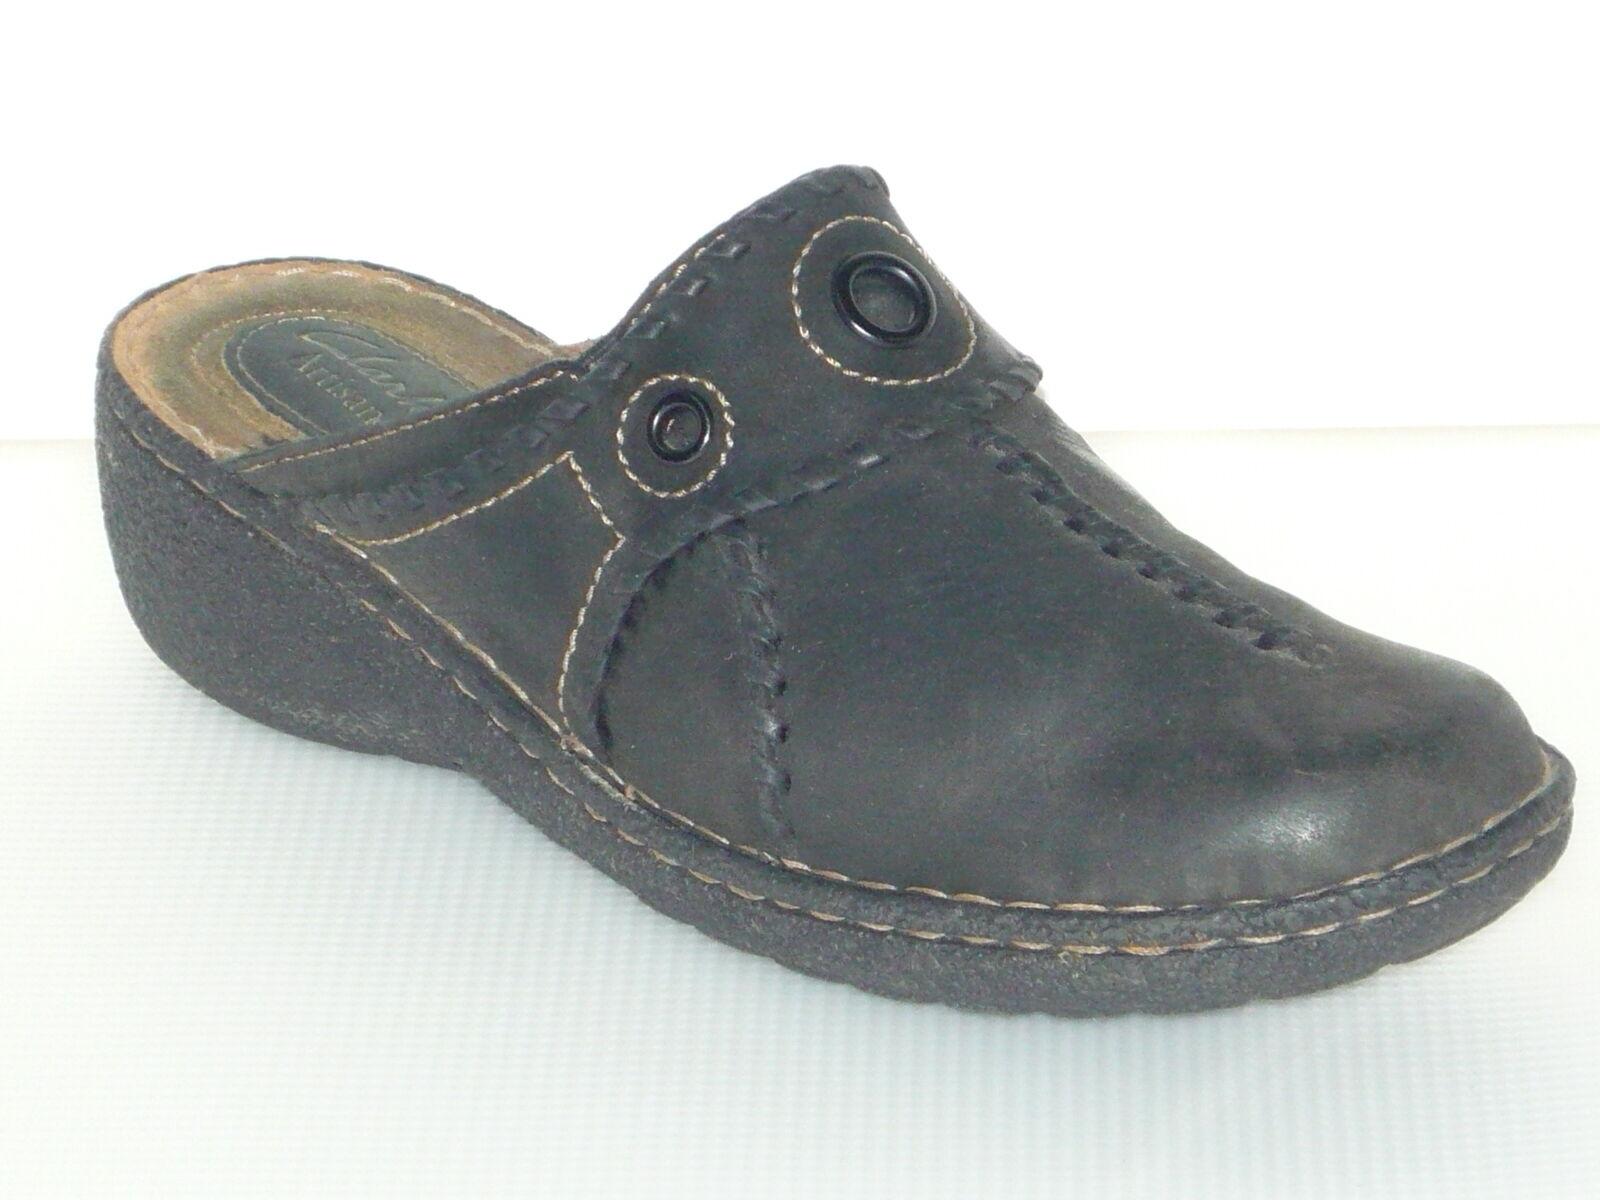 Clarks Artisan Chaussures Femmes Sabots Mules Bas En Cuir Noir Taille 8.5 M